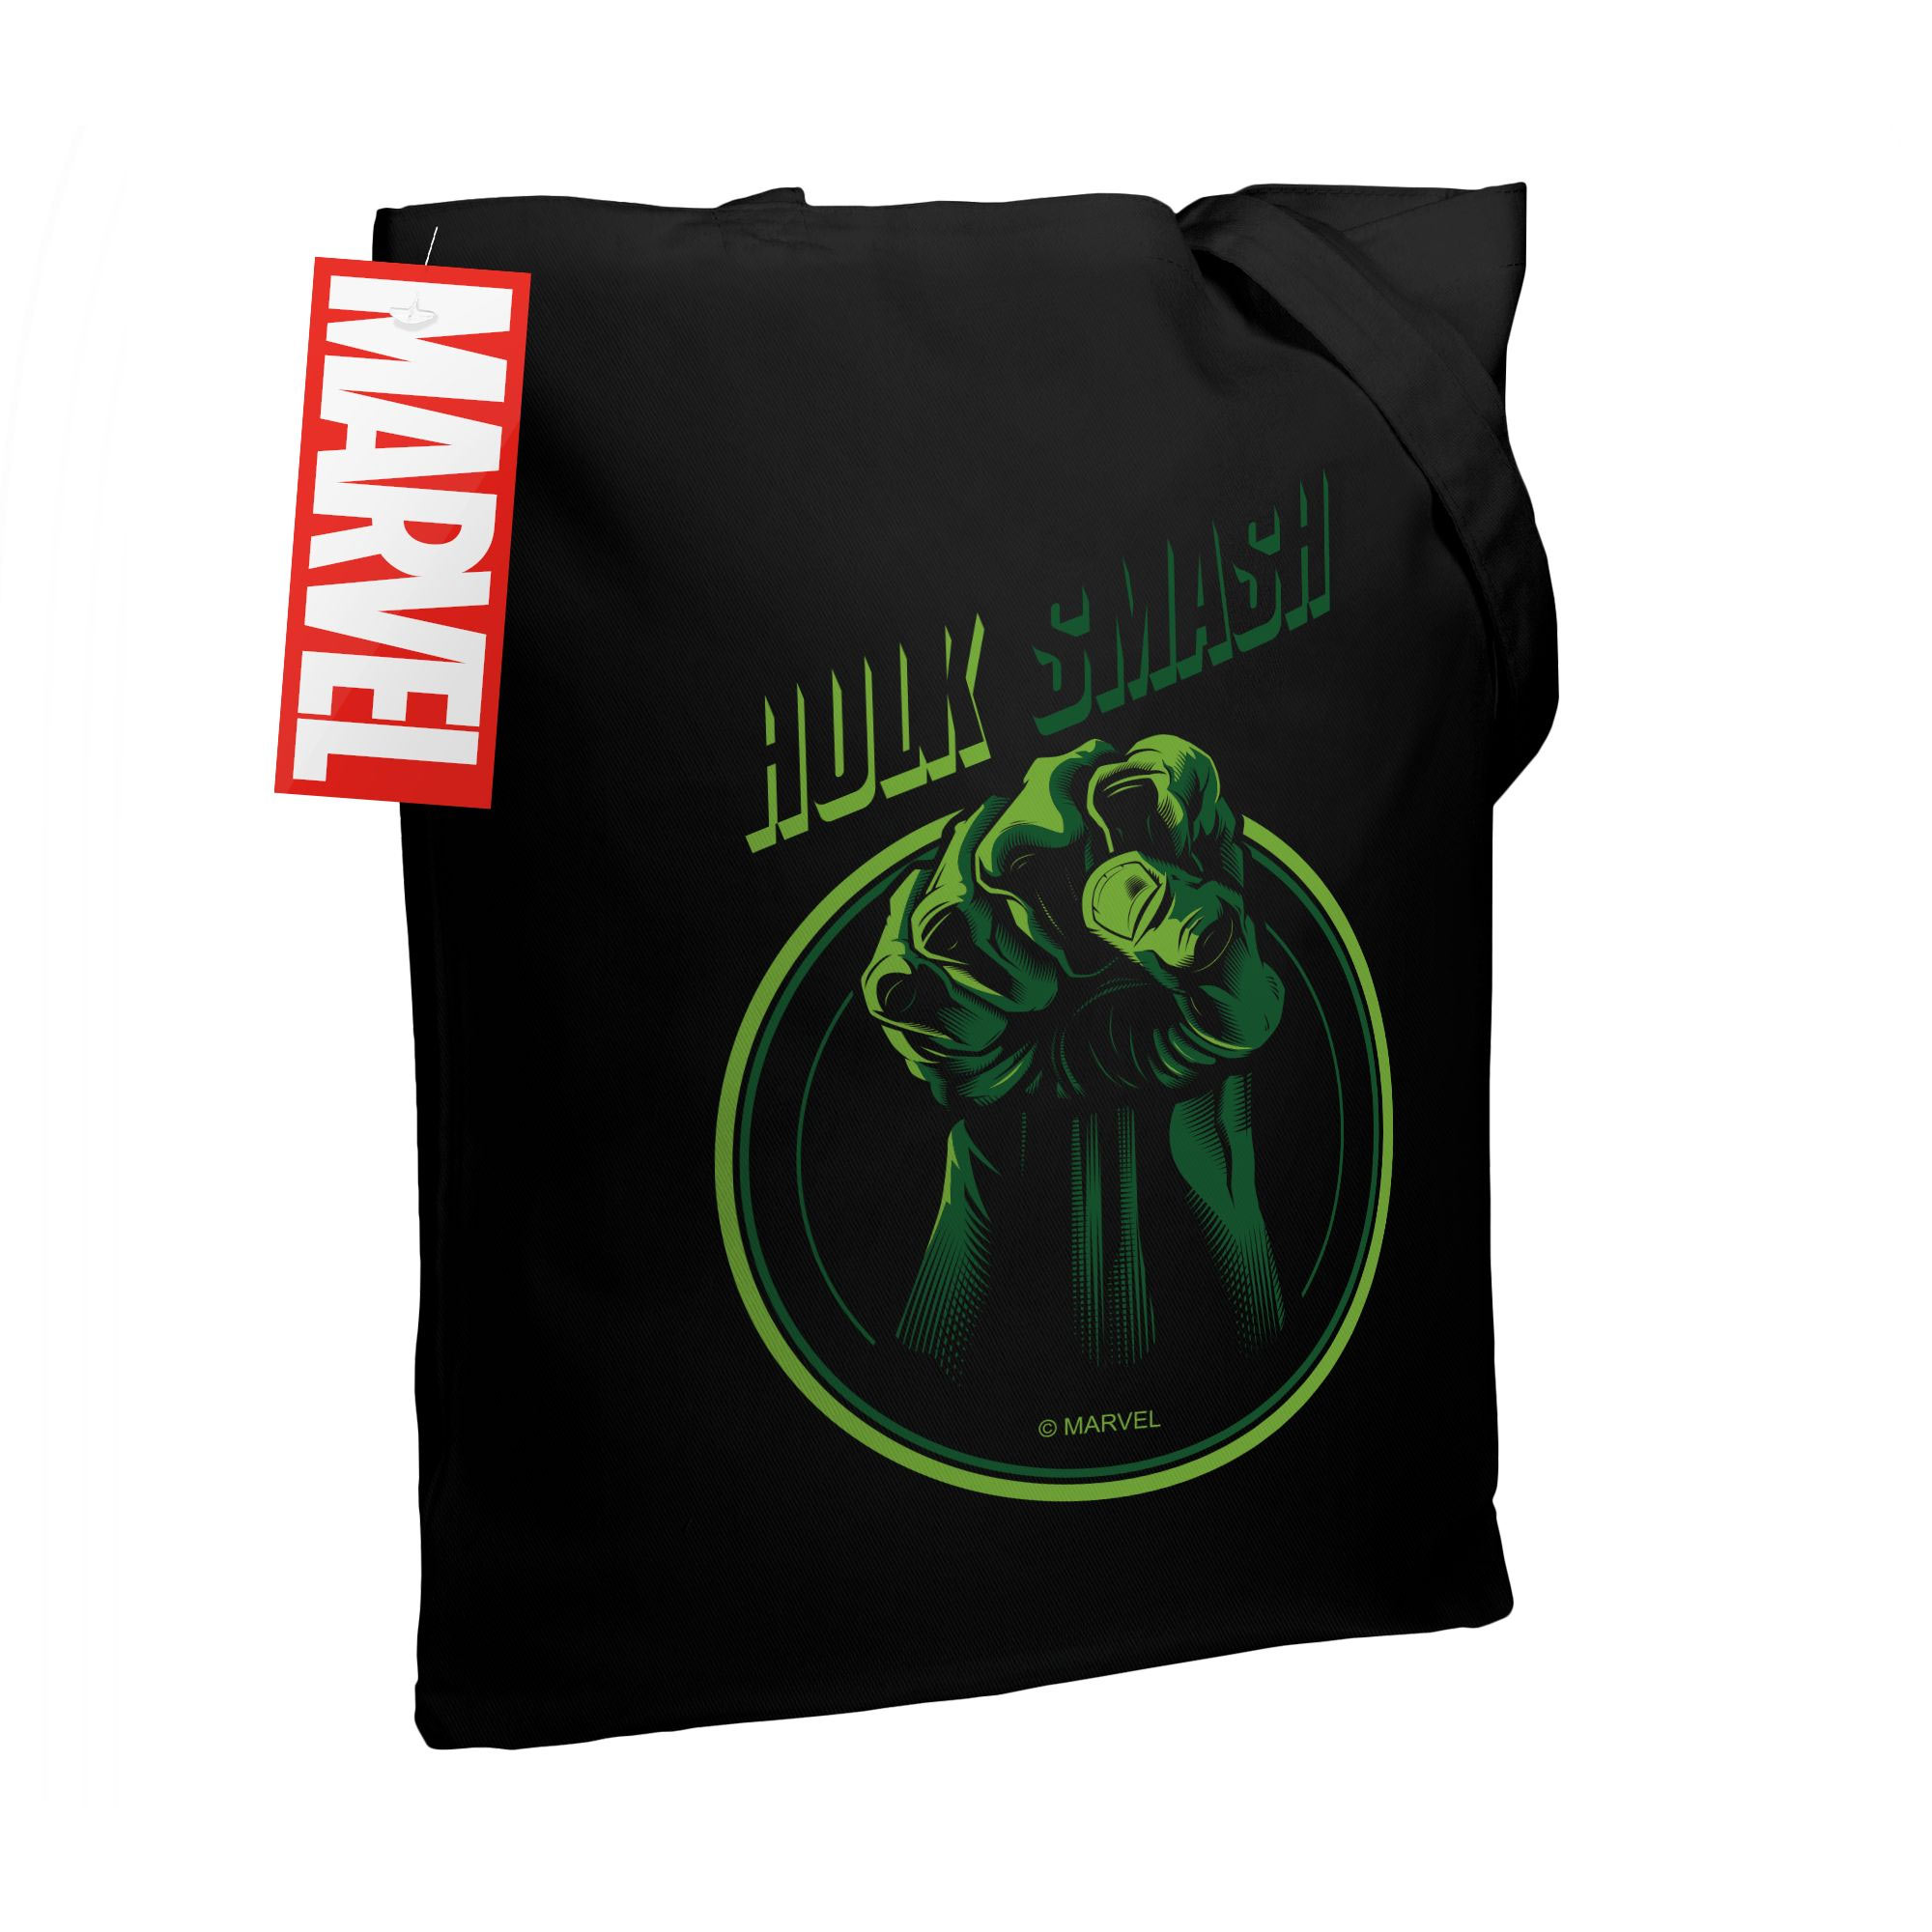 Холщовая сумка Hulk Smash, черная арт 55517.30